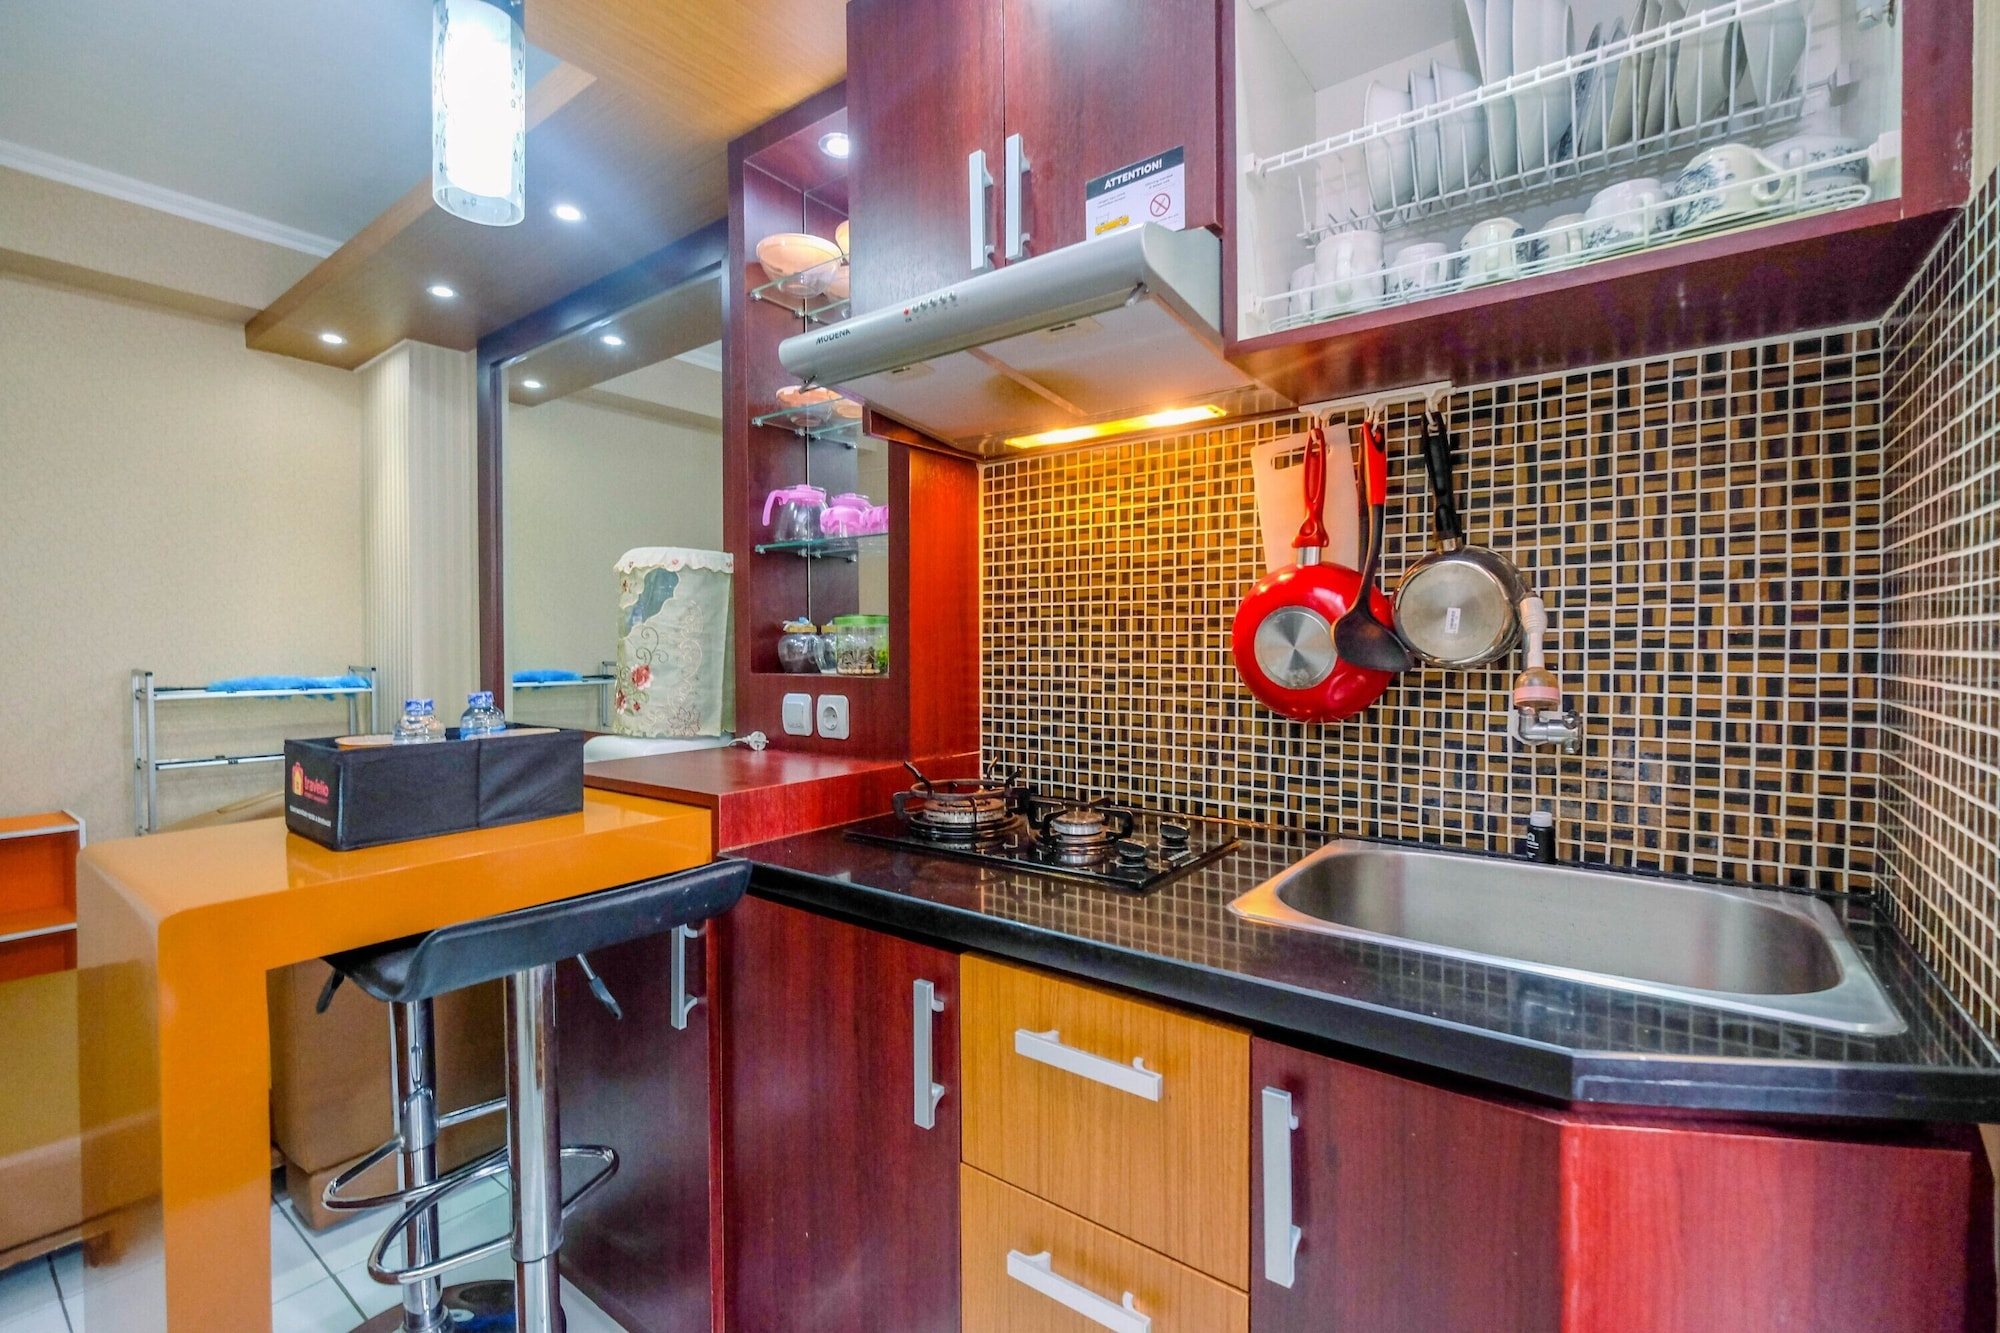 Minimalist 2BR Apartment at Kalibata City near Shopping Center, South Jakarta